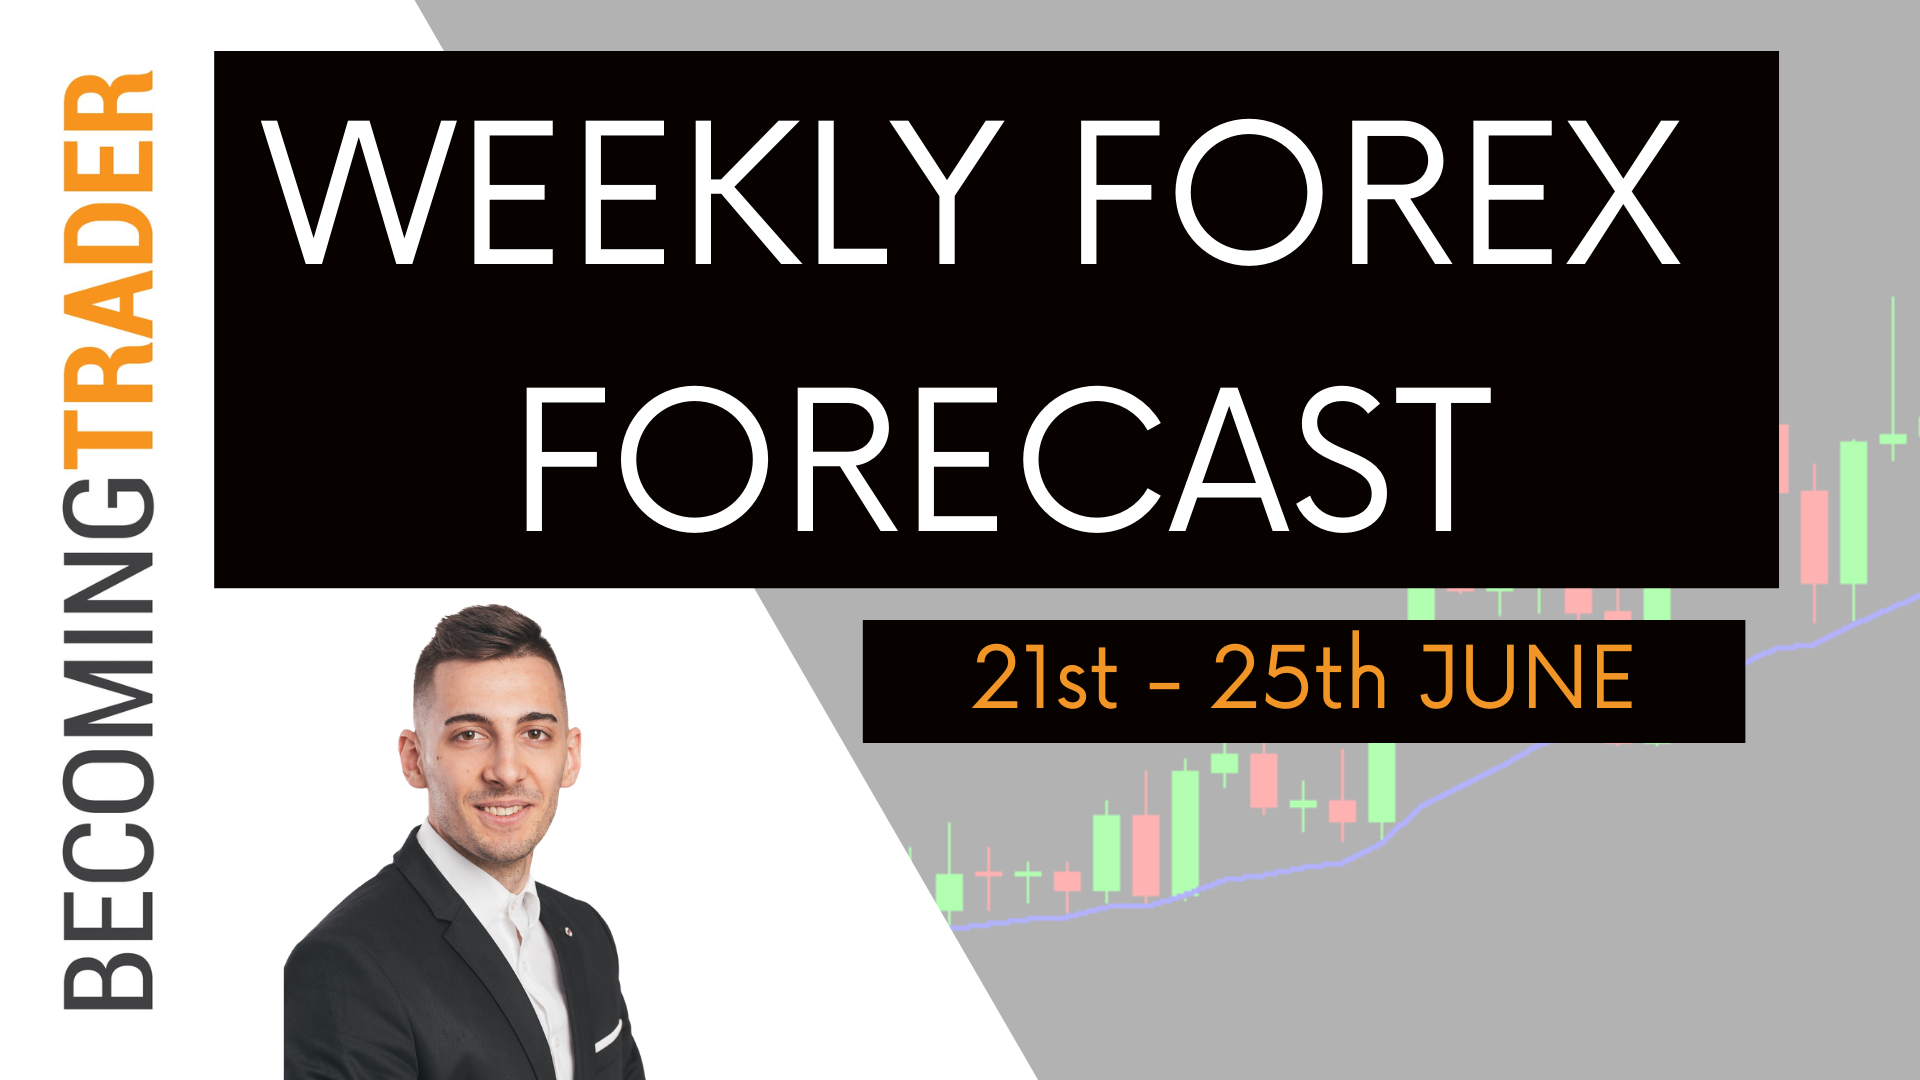 Weekly Forex Forecast 21st to 25th June 2021 | EURUSD , GBPUSD , AUDUSD , NZDUSD , USDCAD , USDJPY